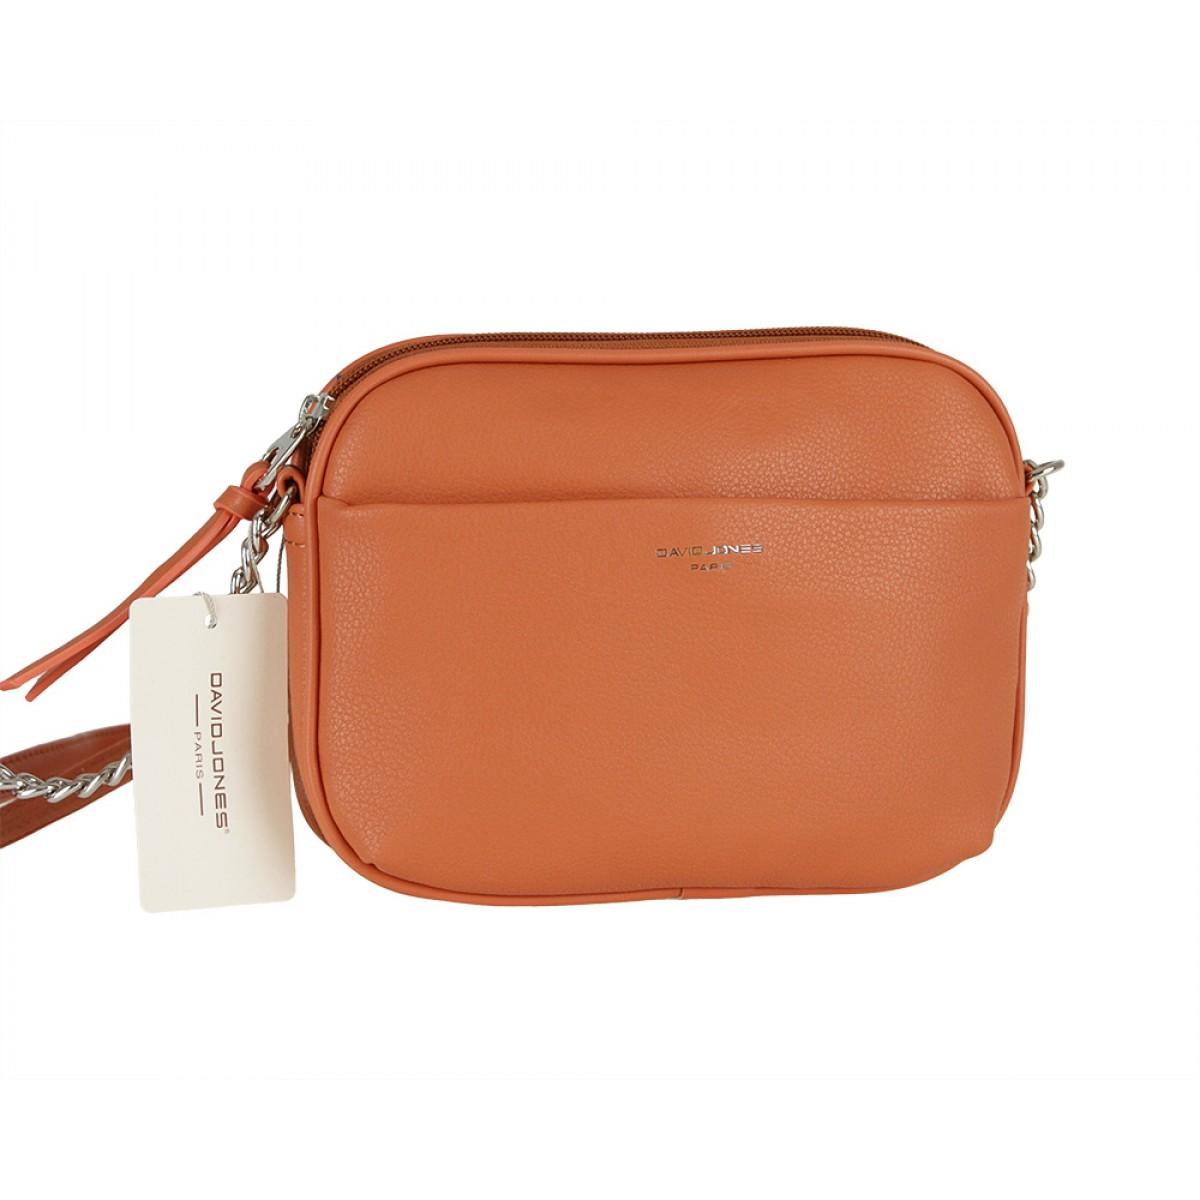 Жіноча сумка David Jones 6129-1 CORAL